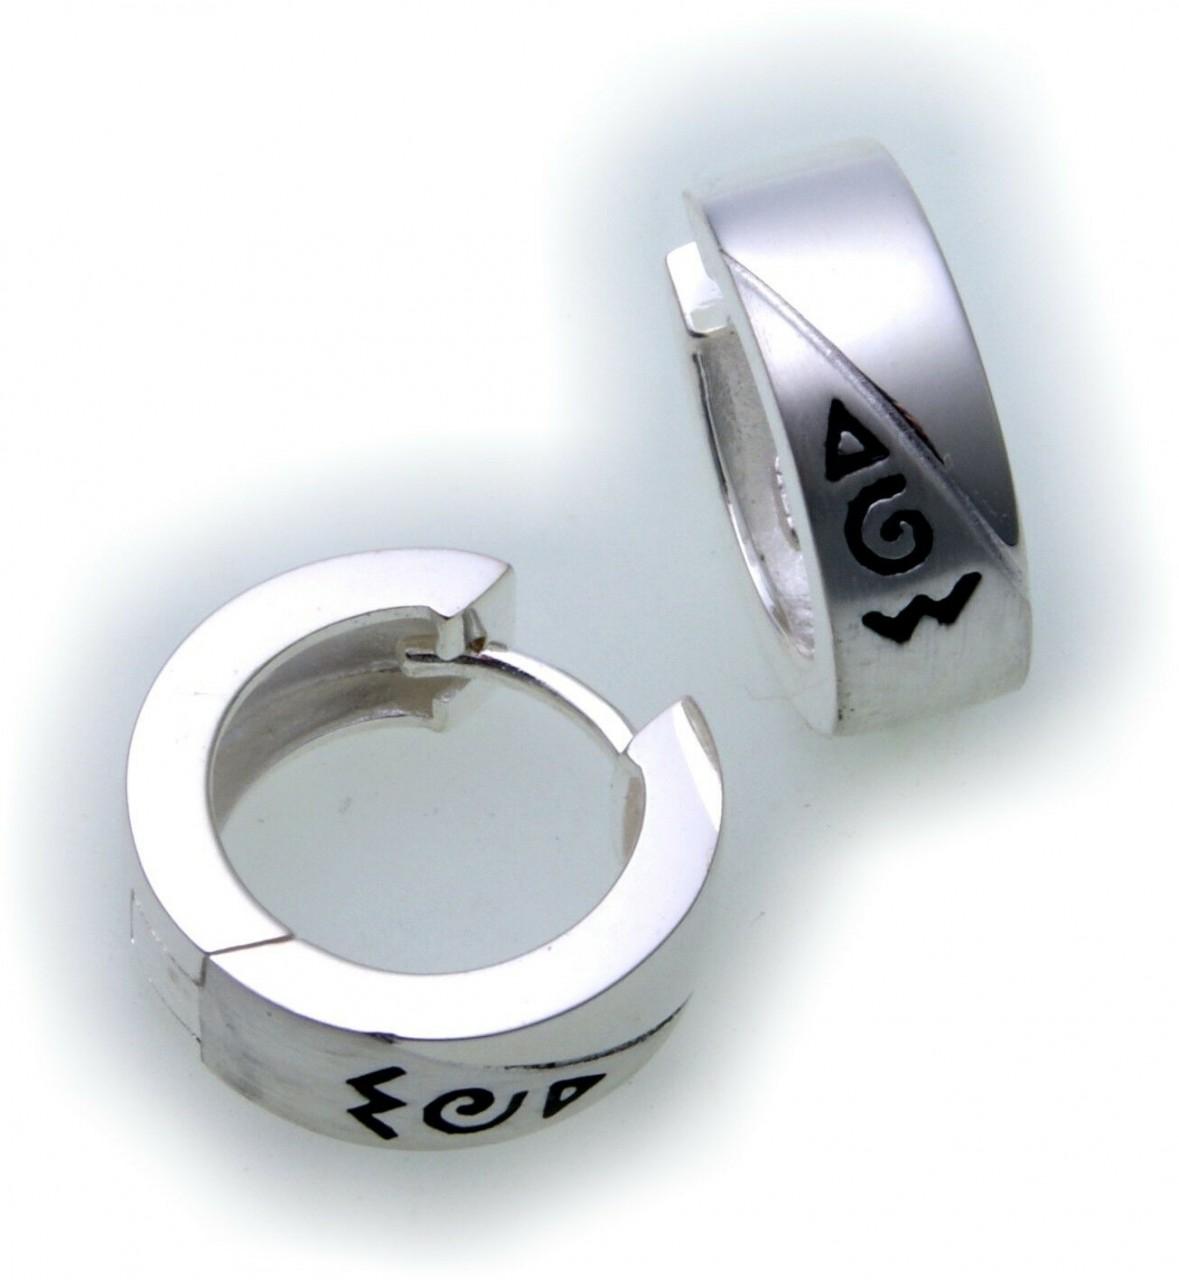 Damen Ohrringe Klapp Creolen echt Silber 925 Sterlingsilber 15 mm Z2208